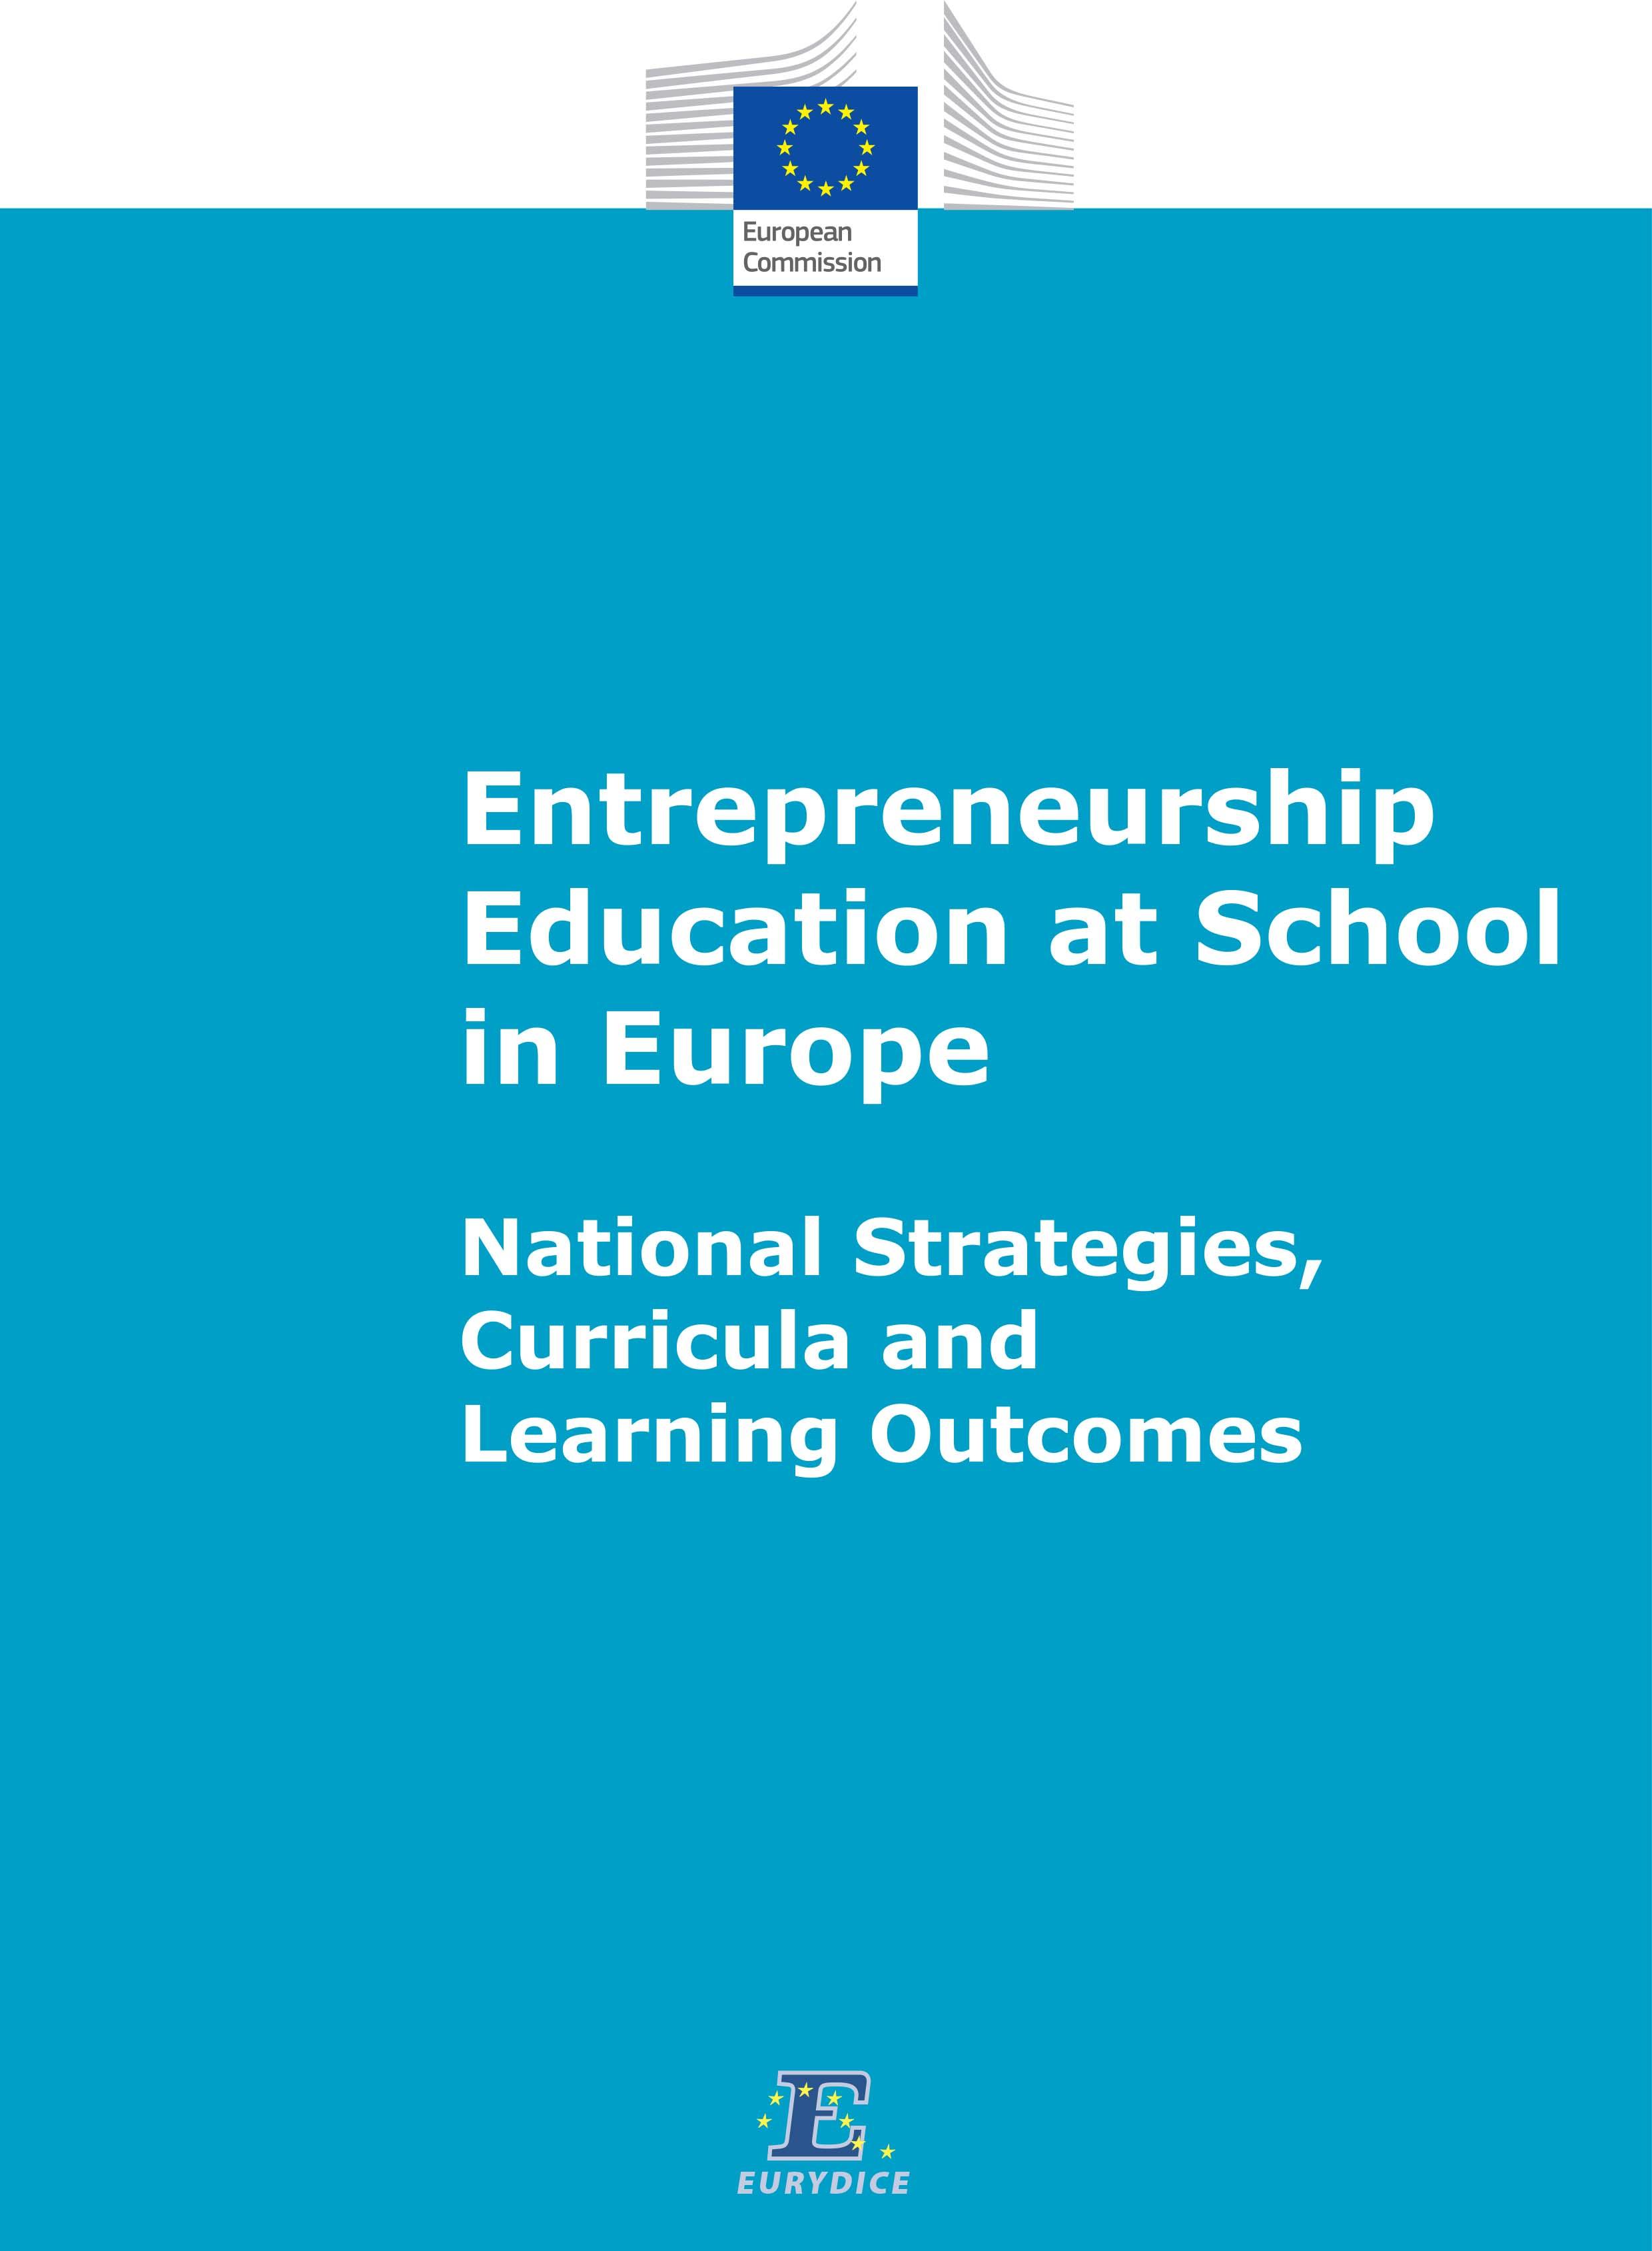 Entrepreneurship Education at School in Europe. National Strateg